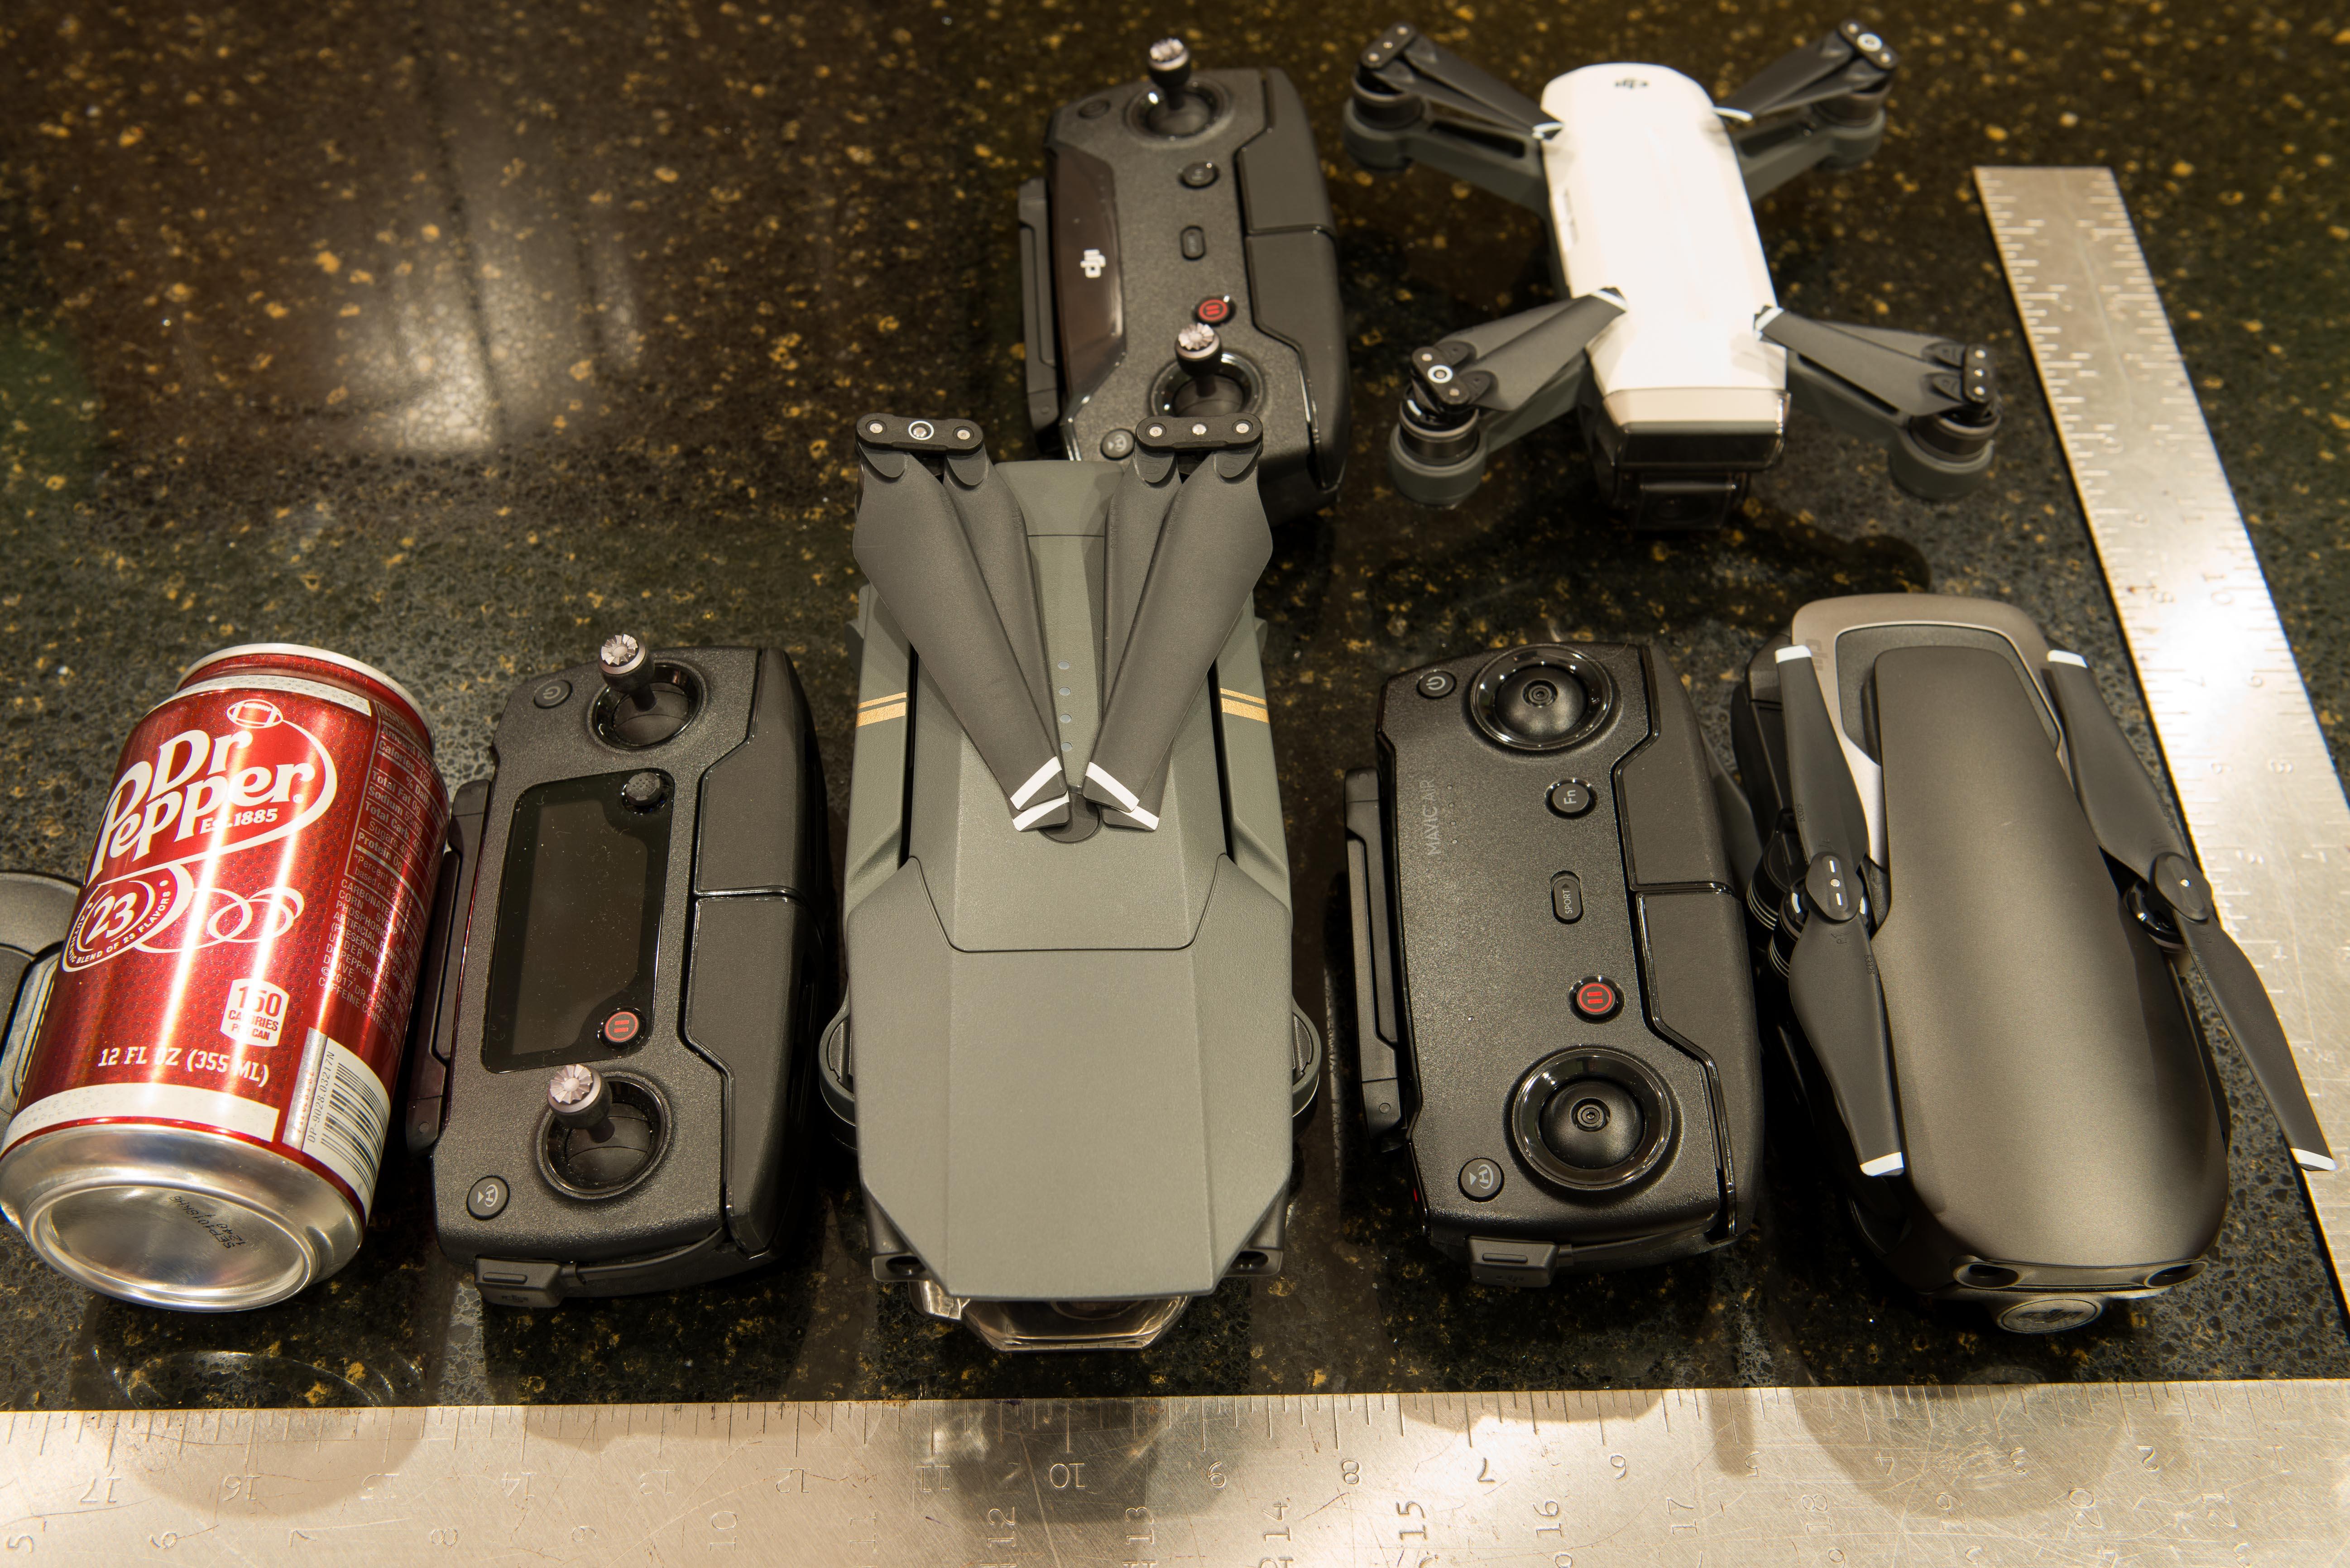 Quad Compare - Mavic Air, Mavic Pro, Spark-5.jpg